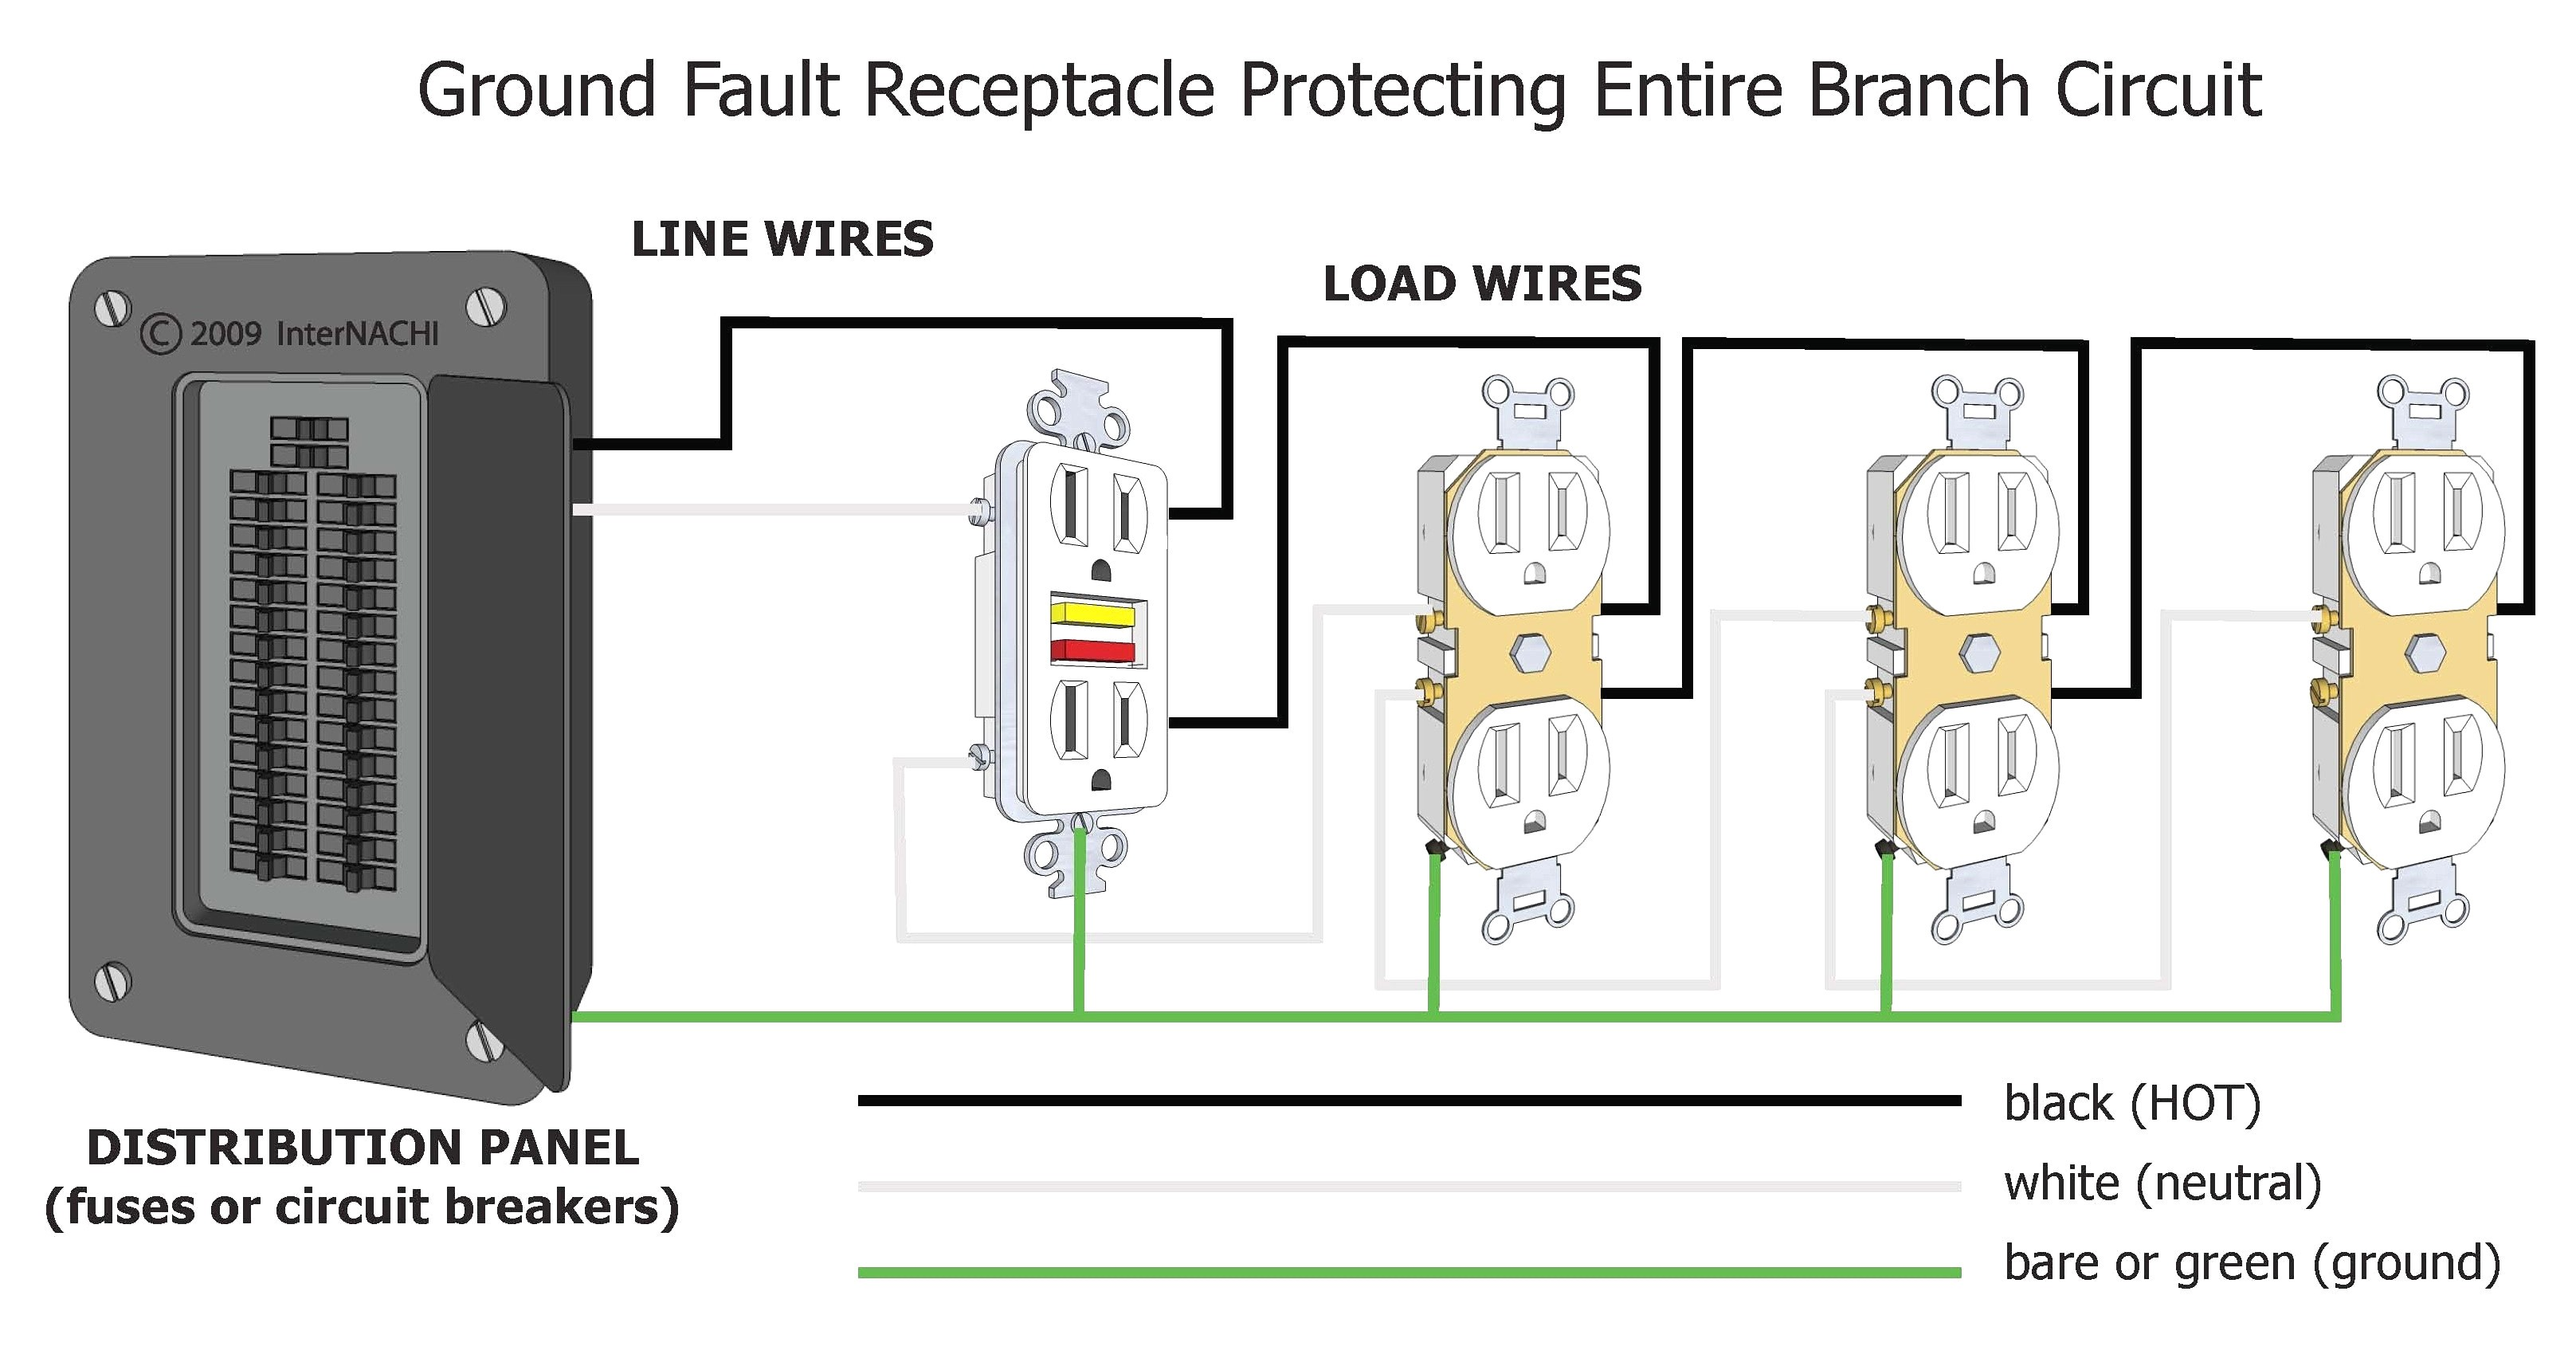 Gfci Breaker Wiring Diagram Inspiration Feed Through Method In Amazing Diagrams